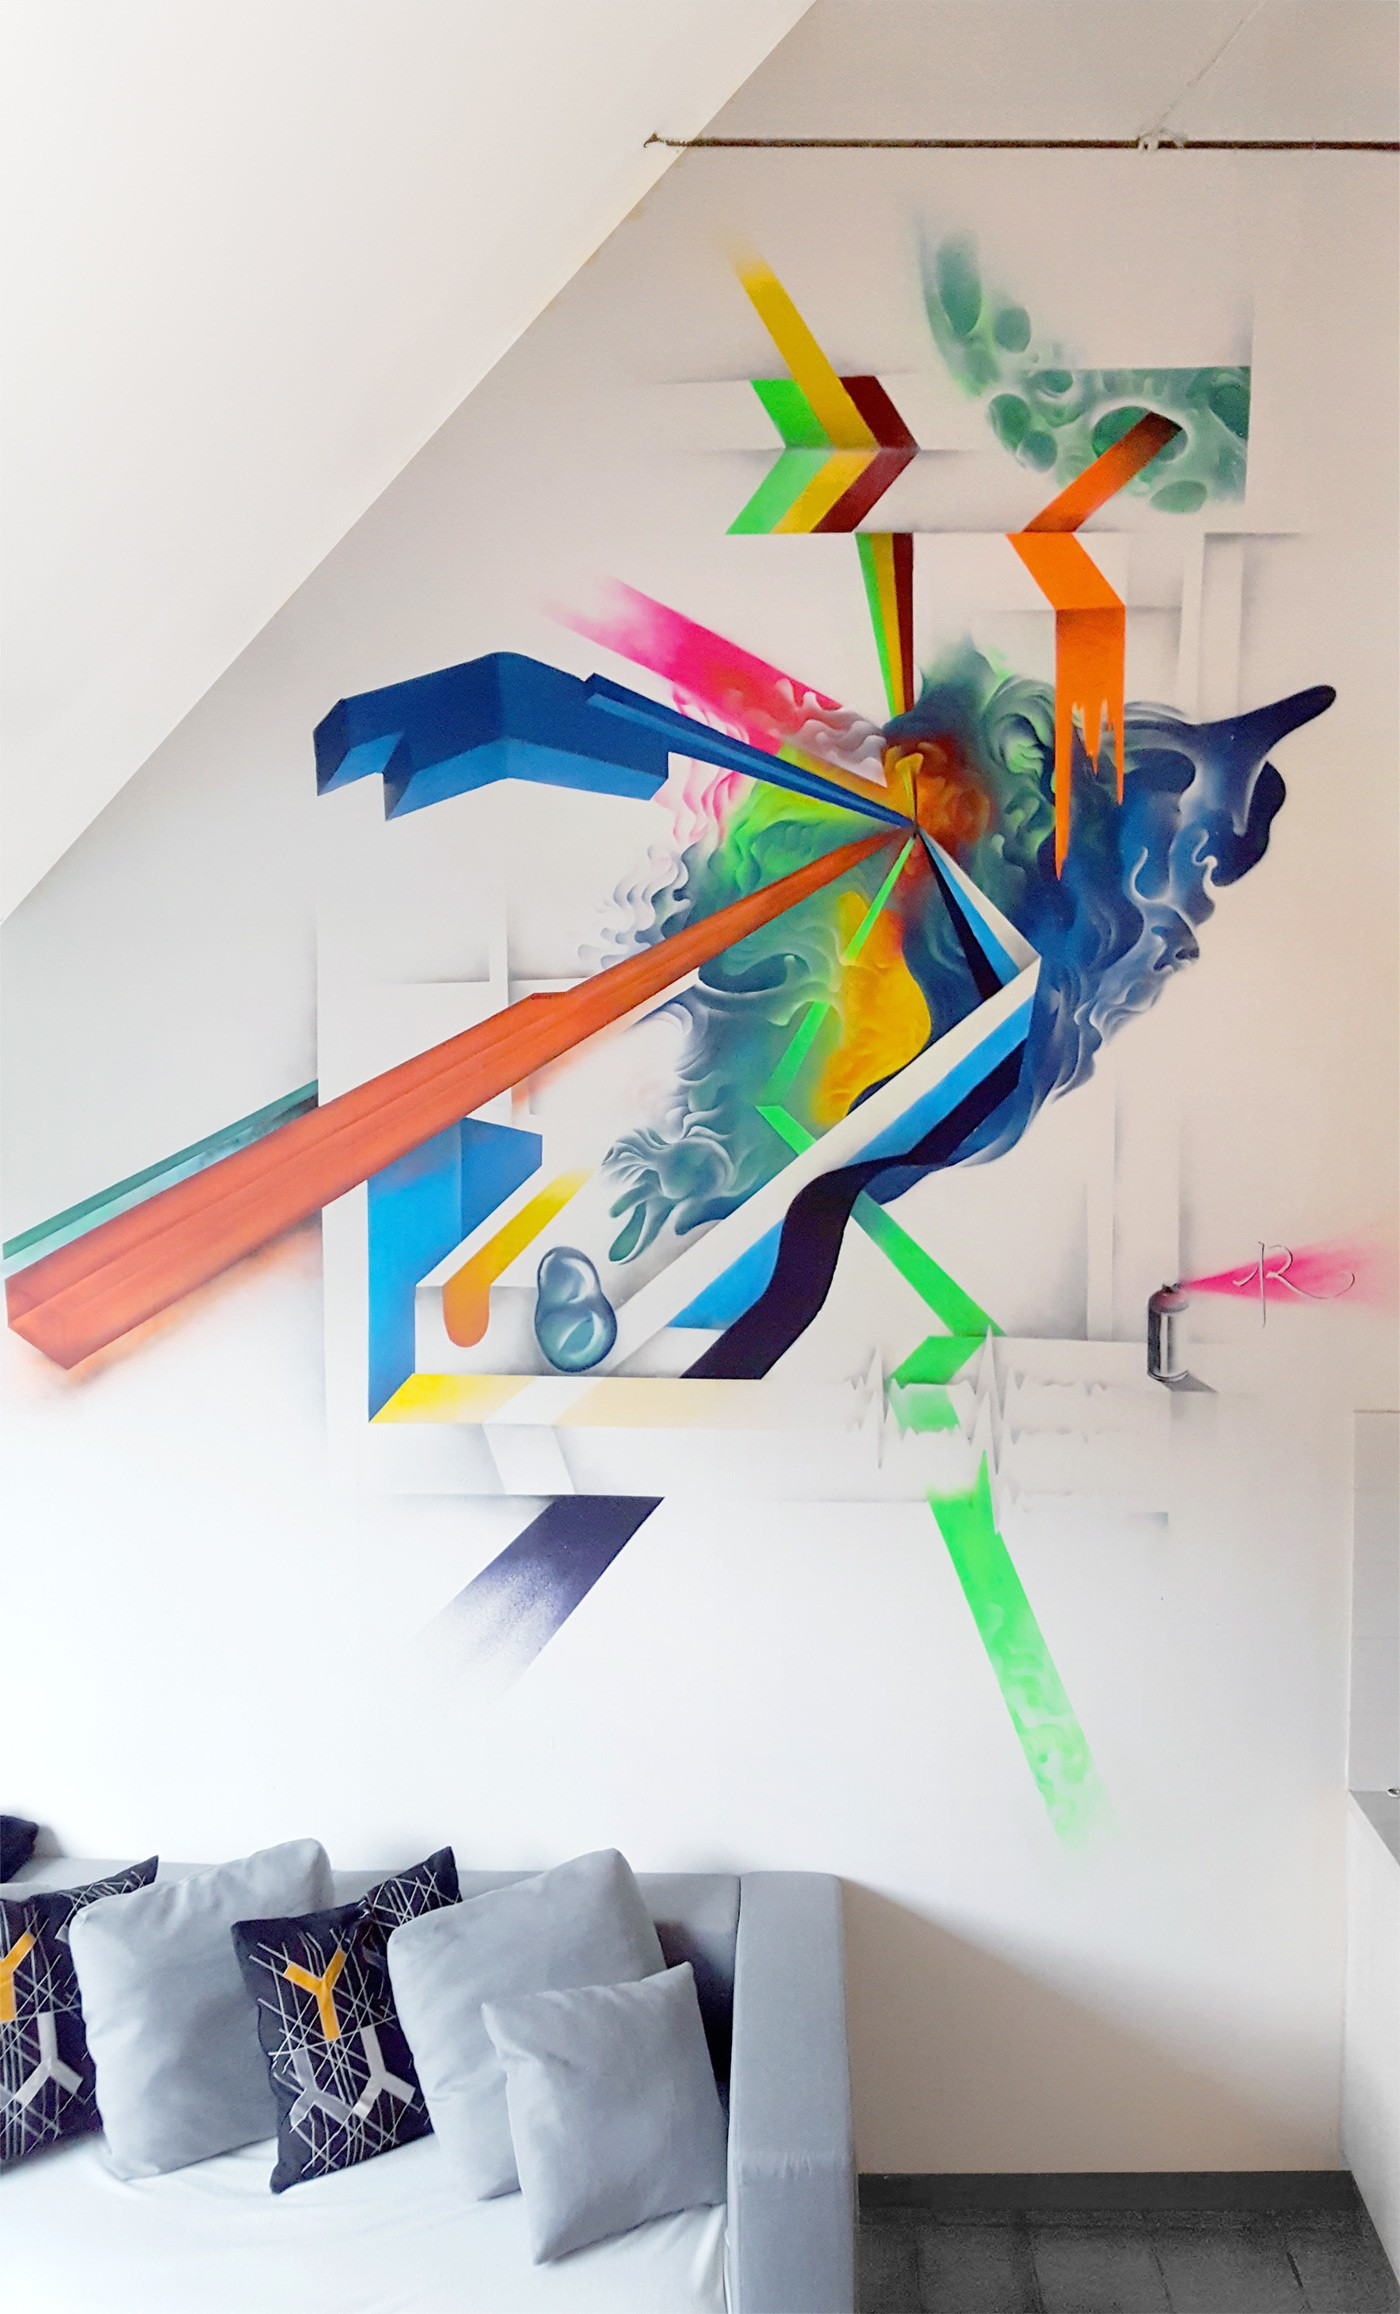 https://www.propaganza.be/wp-content/uploads/2015/09/propaganza-adrien-roubens-abstrait-abstract-urban-artist-graffiti-graff-street-art-spray-paint-painting-peinture-tag-art-ephemere-brussels-bruxelles-2.jpg